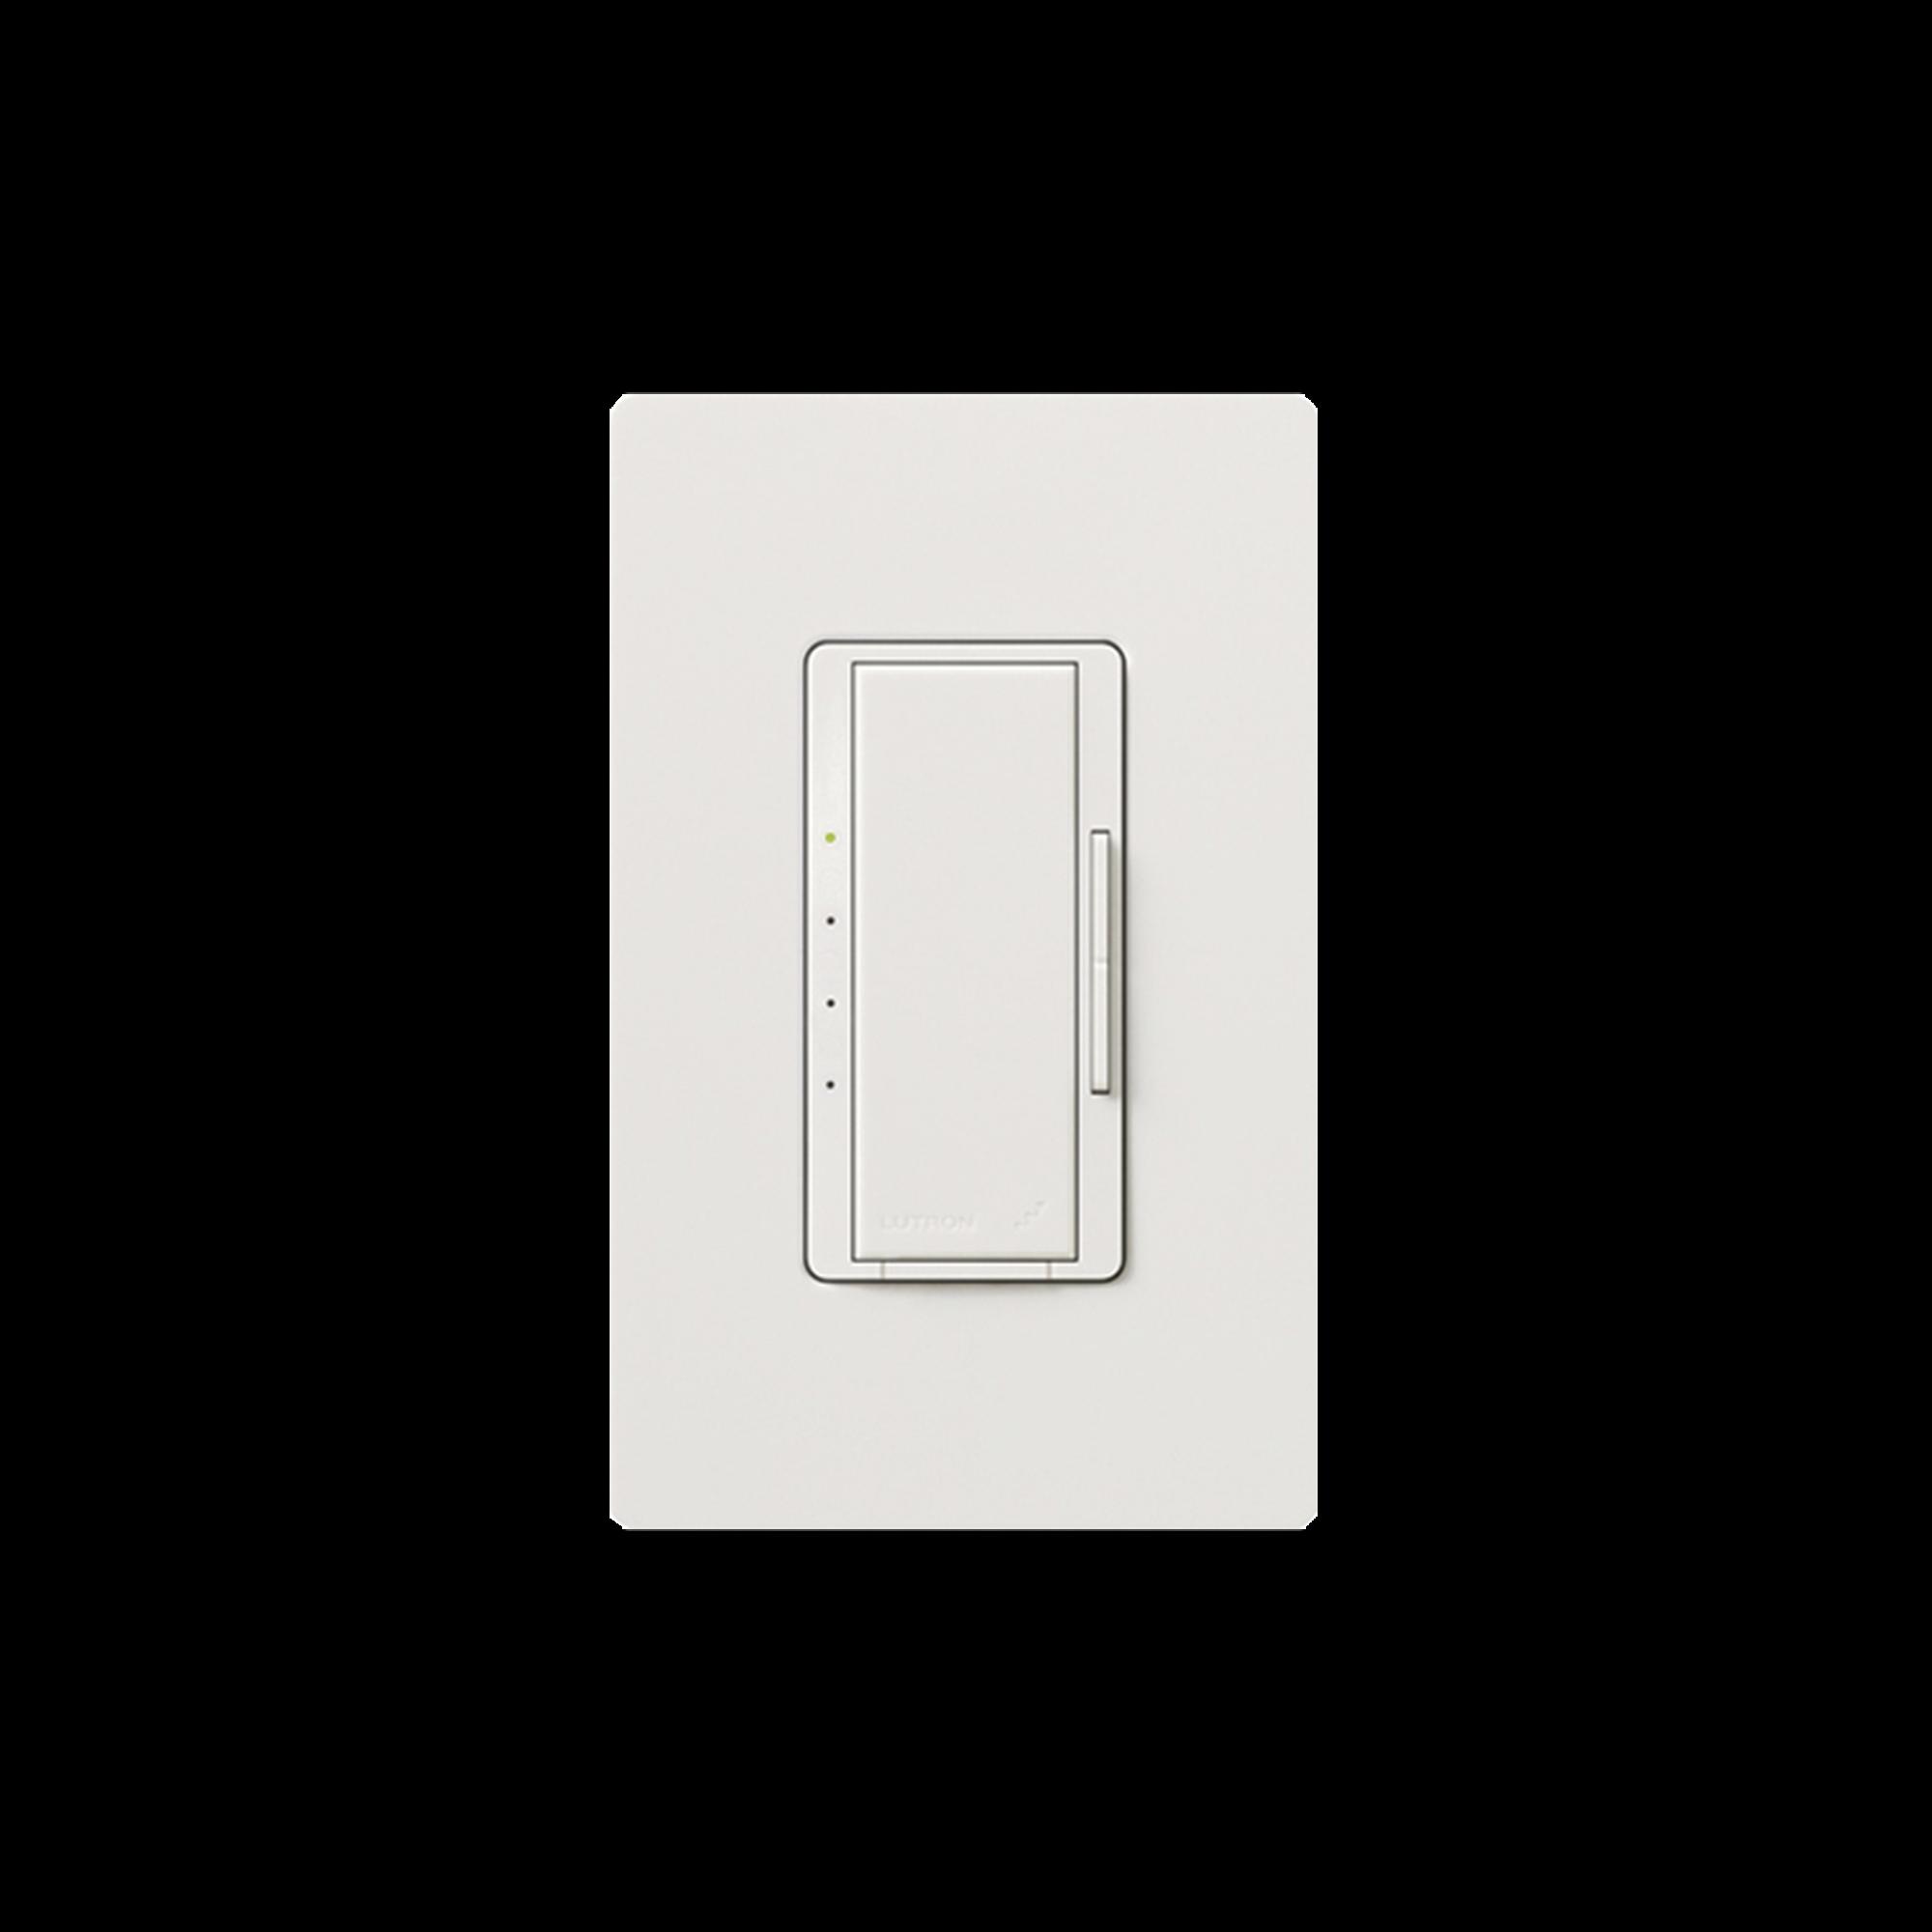 Controlador de ventilador de techo, carga 2A